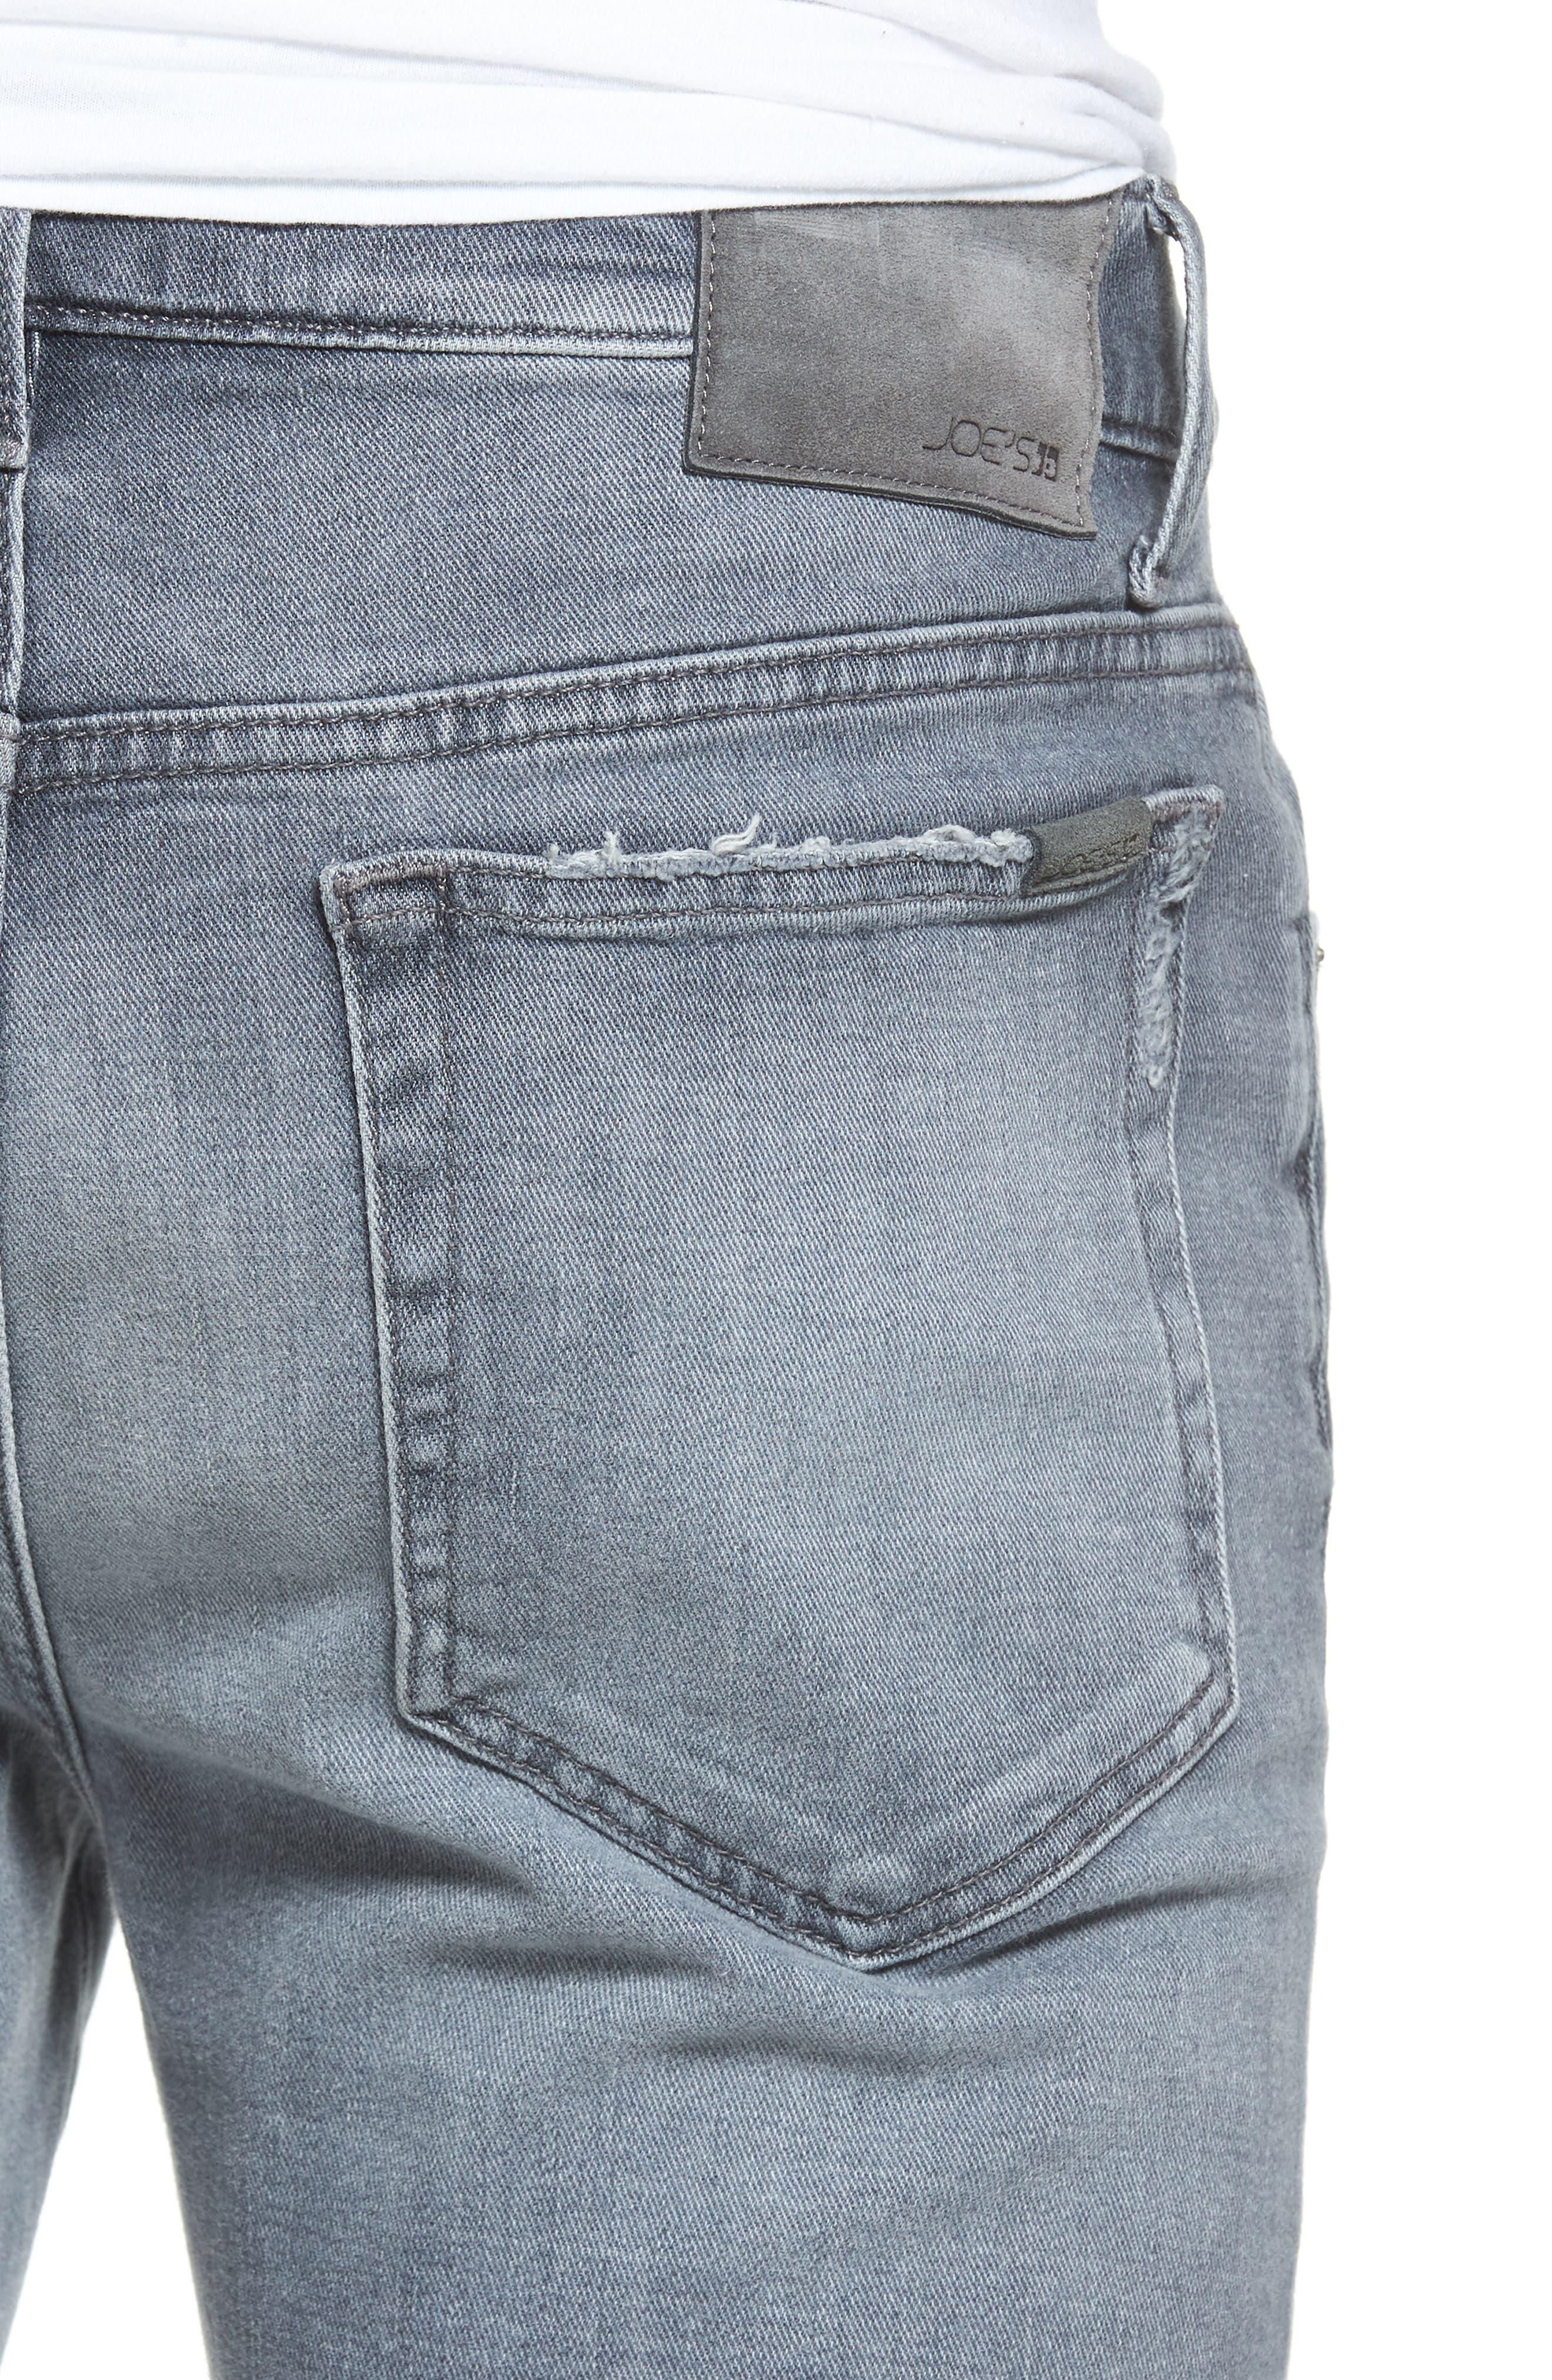 Alternate Image 4  - Joe's Brixton Distressed Slim Straight Fit Jeans (Frehley)